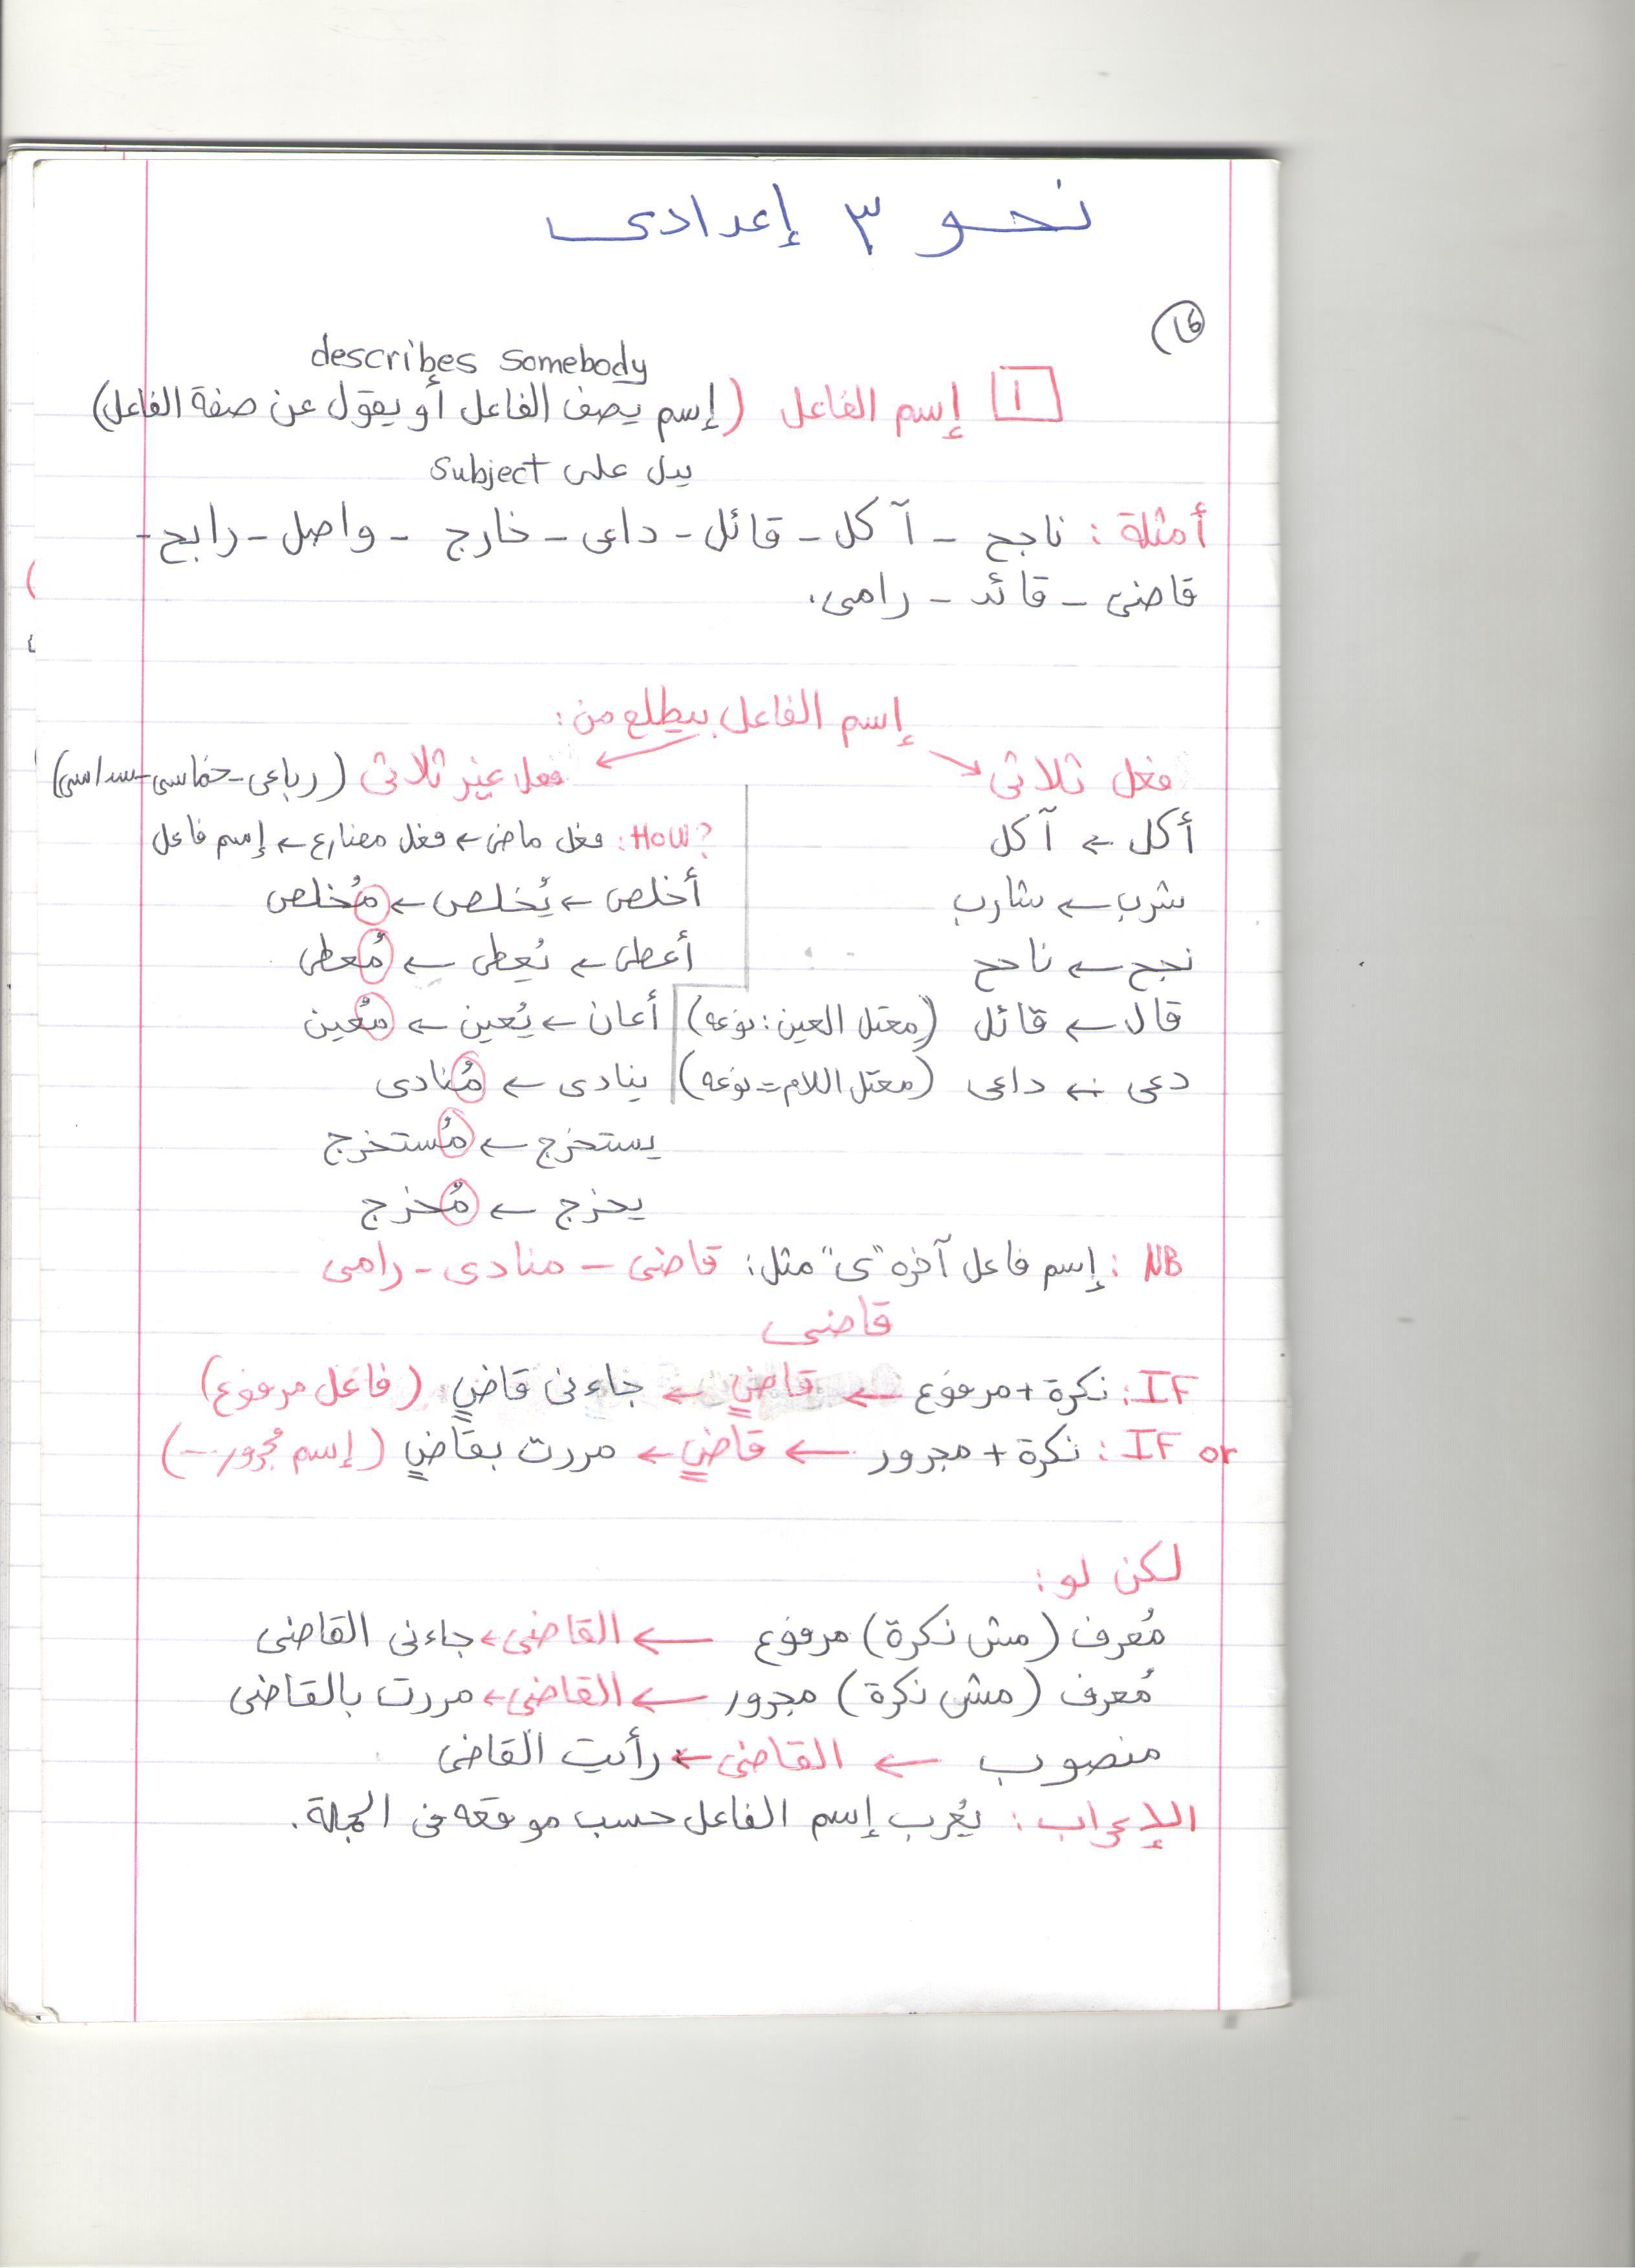 نحو 3 اعدادى 16 23 In 2020 Arabic Language Language Education